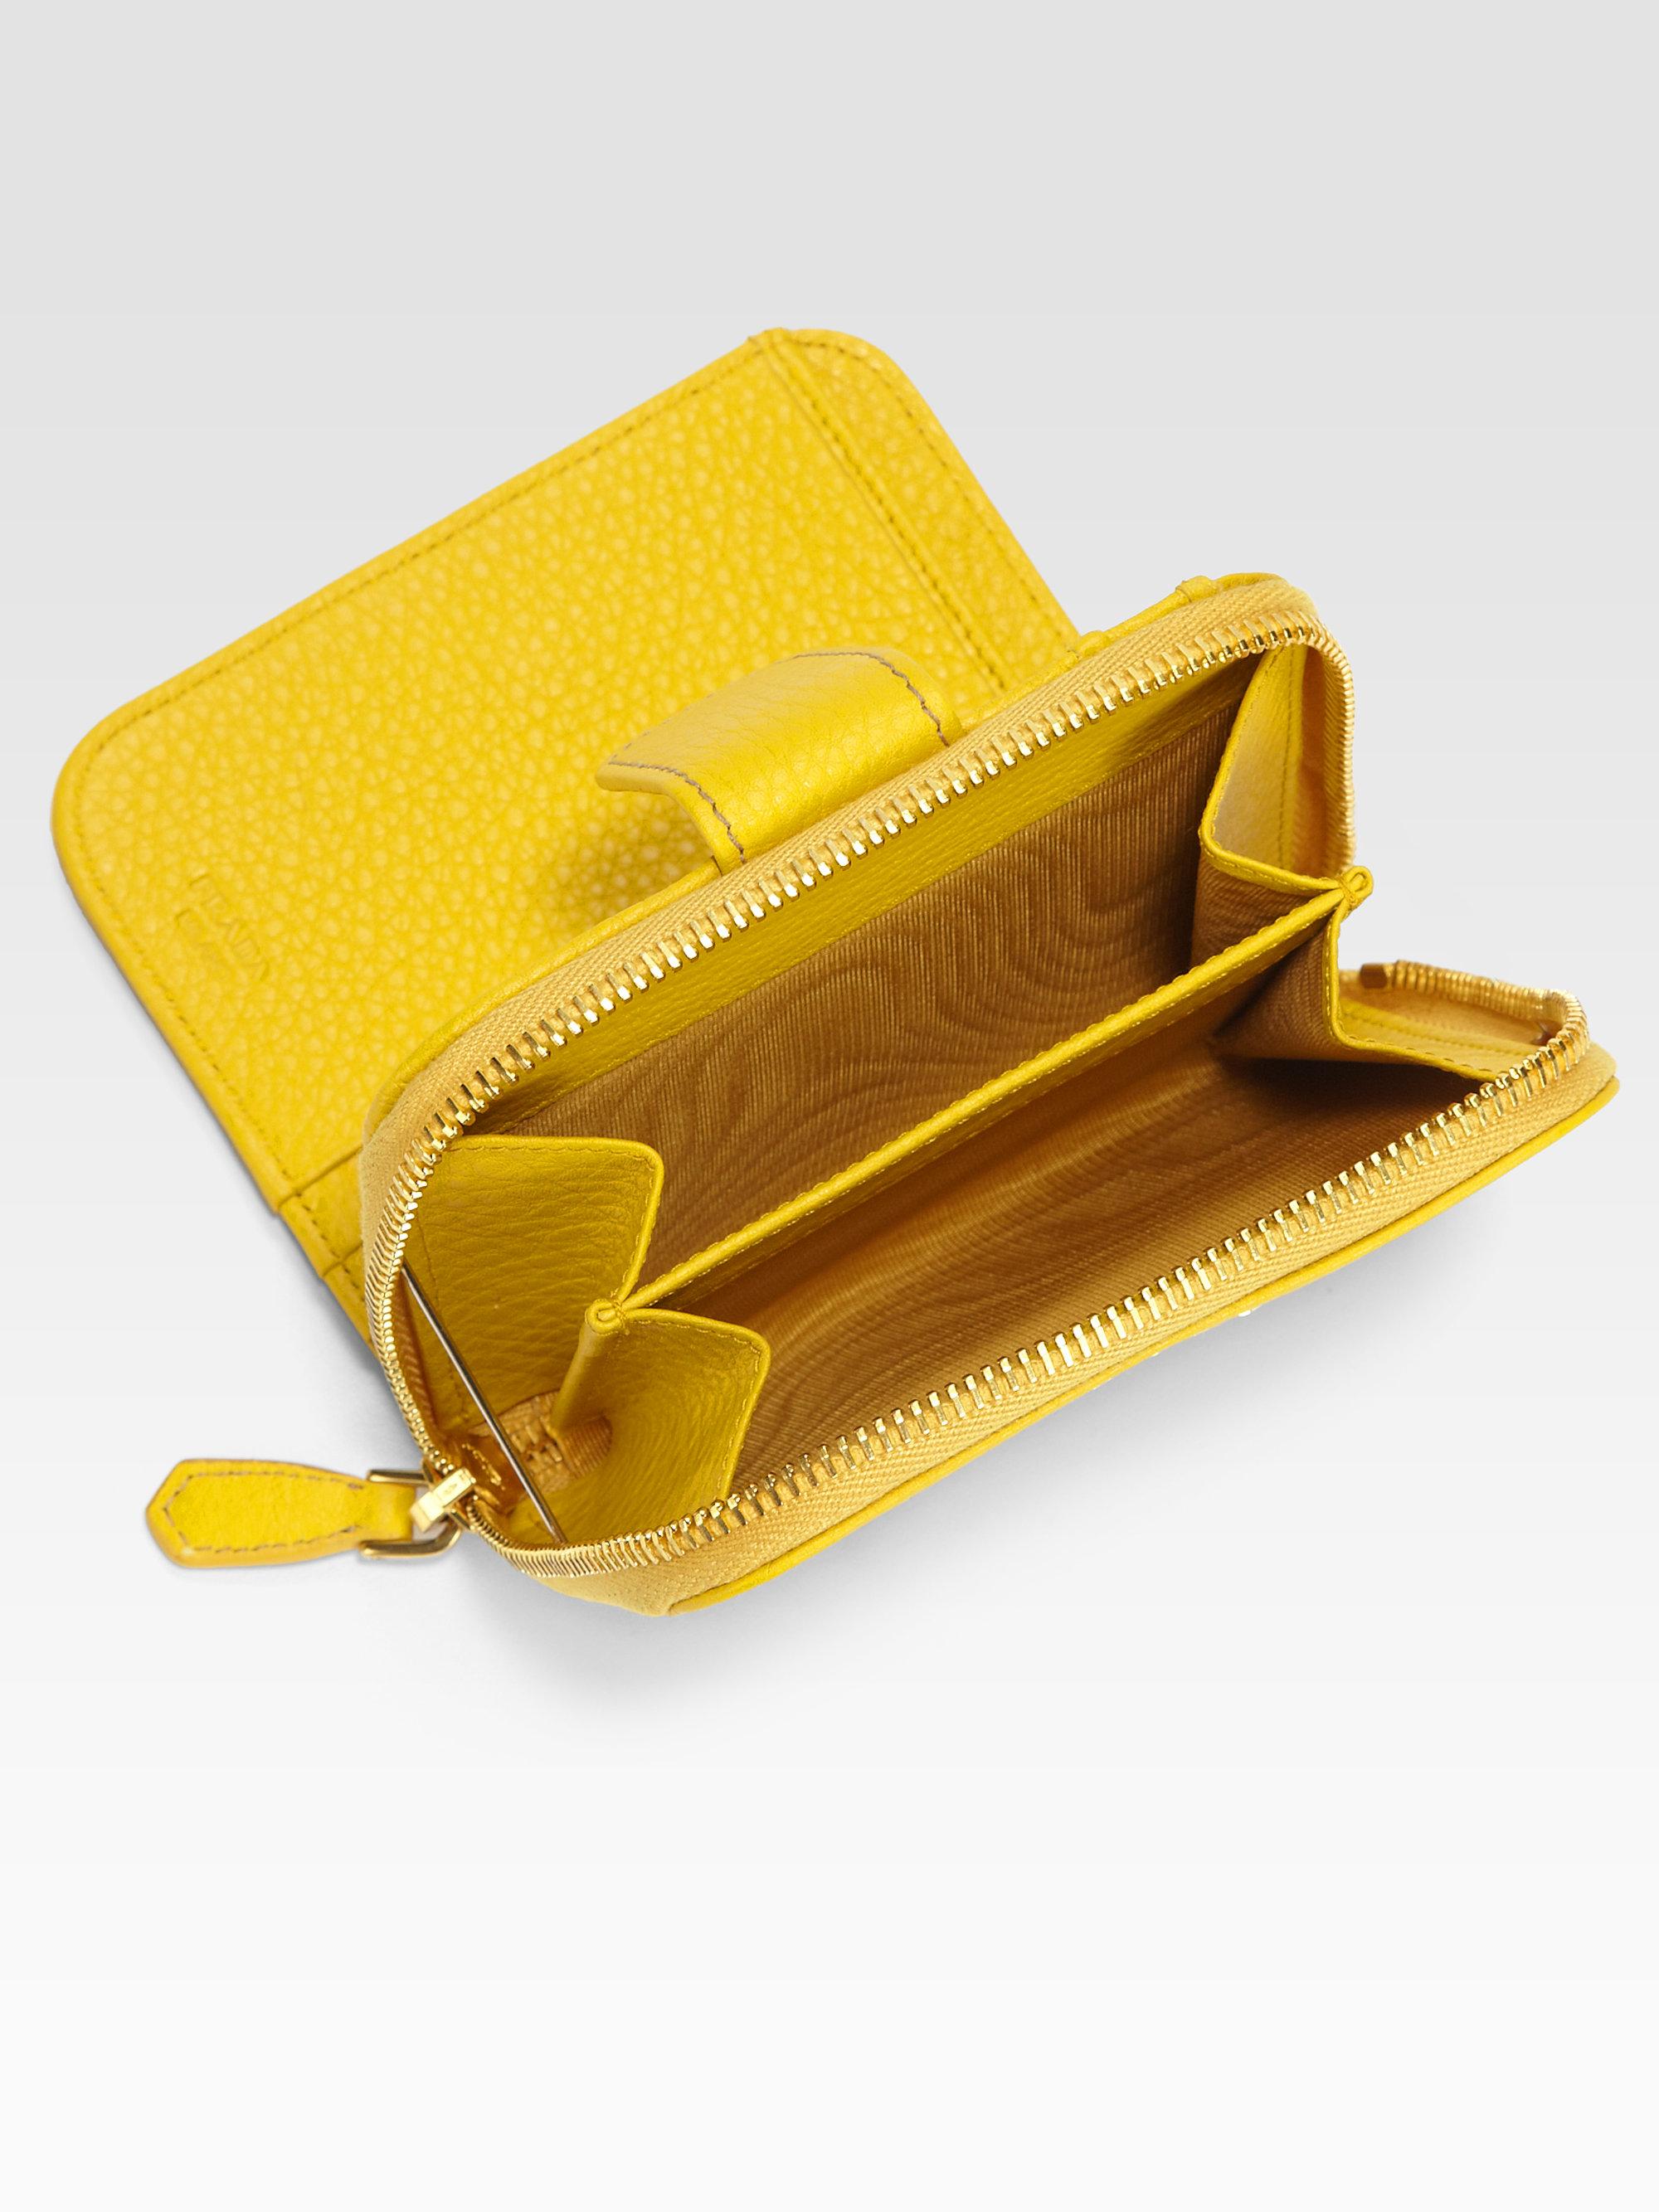 leather prada backpack - prada yellow wallet